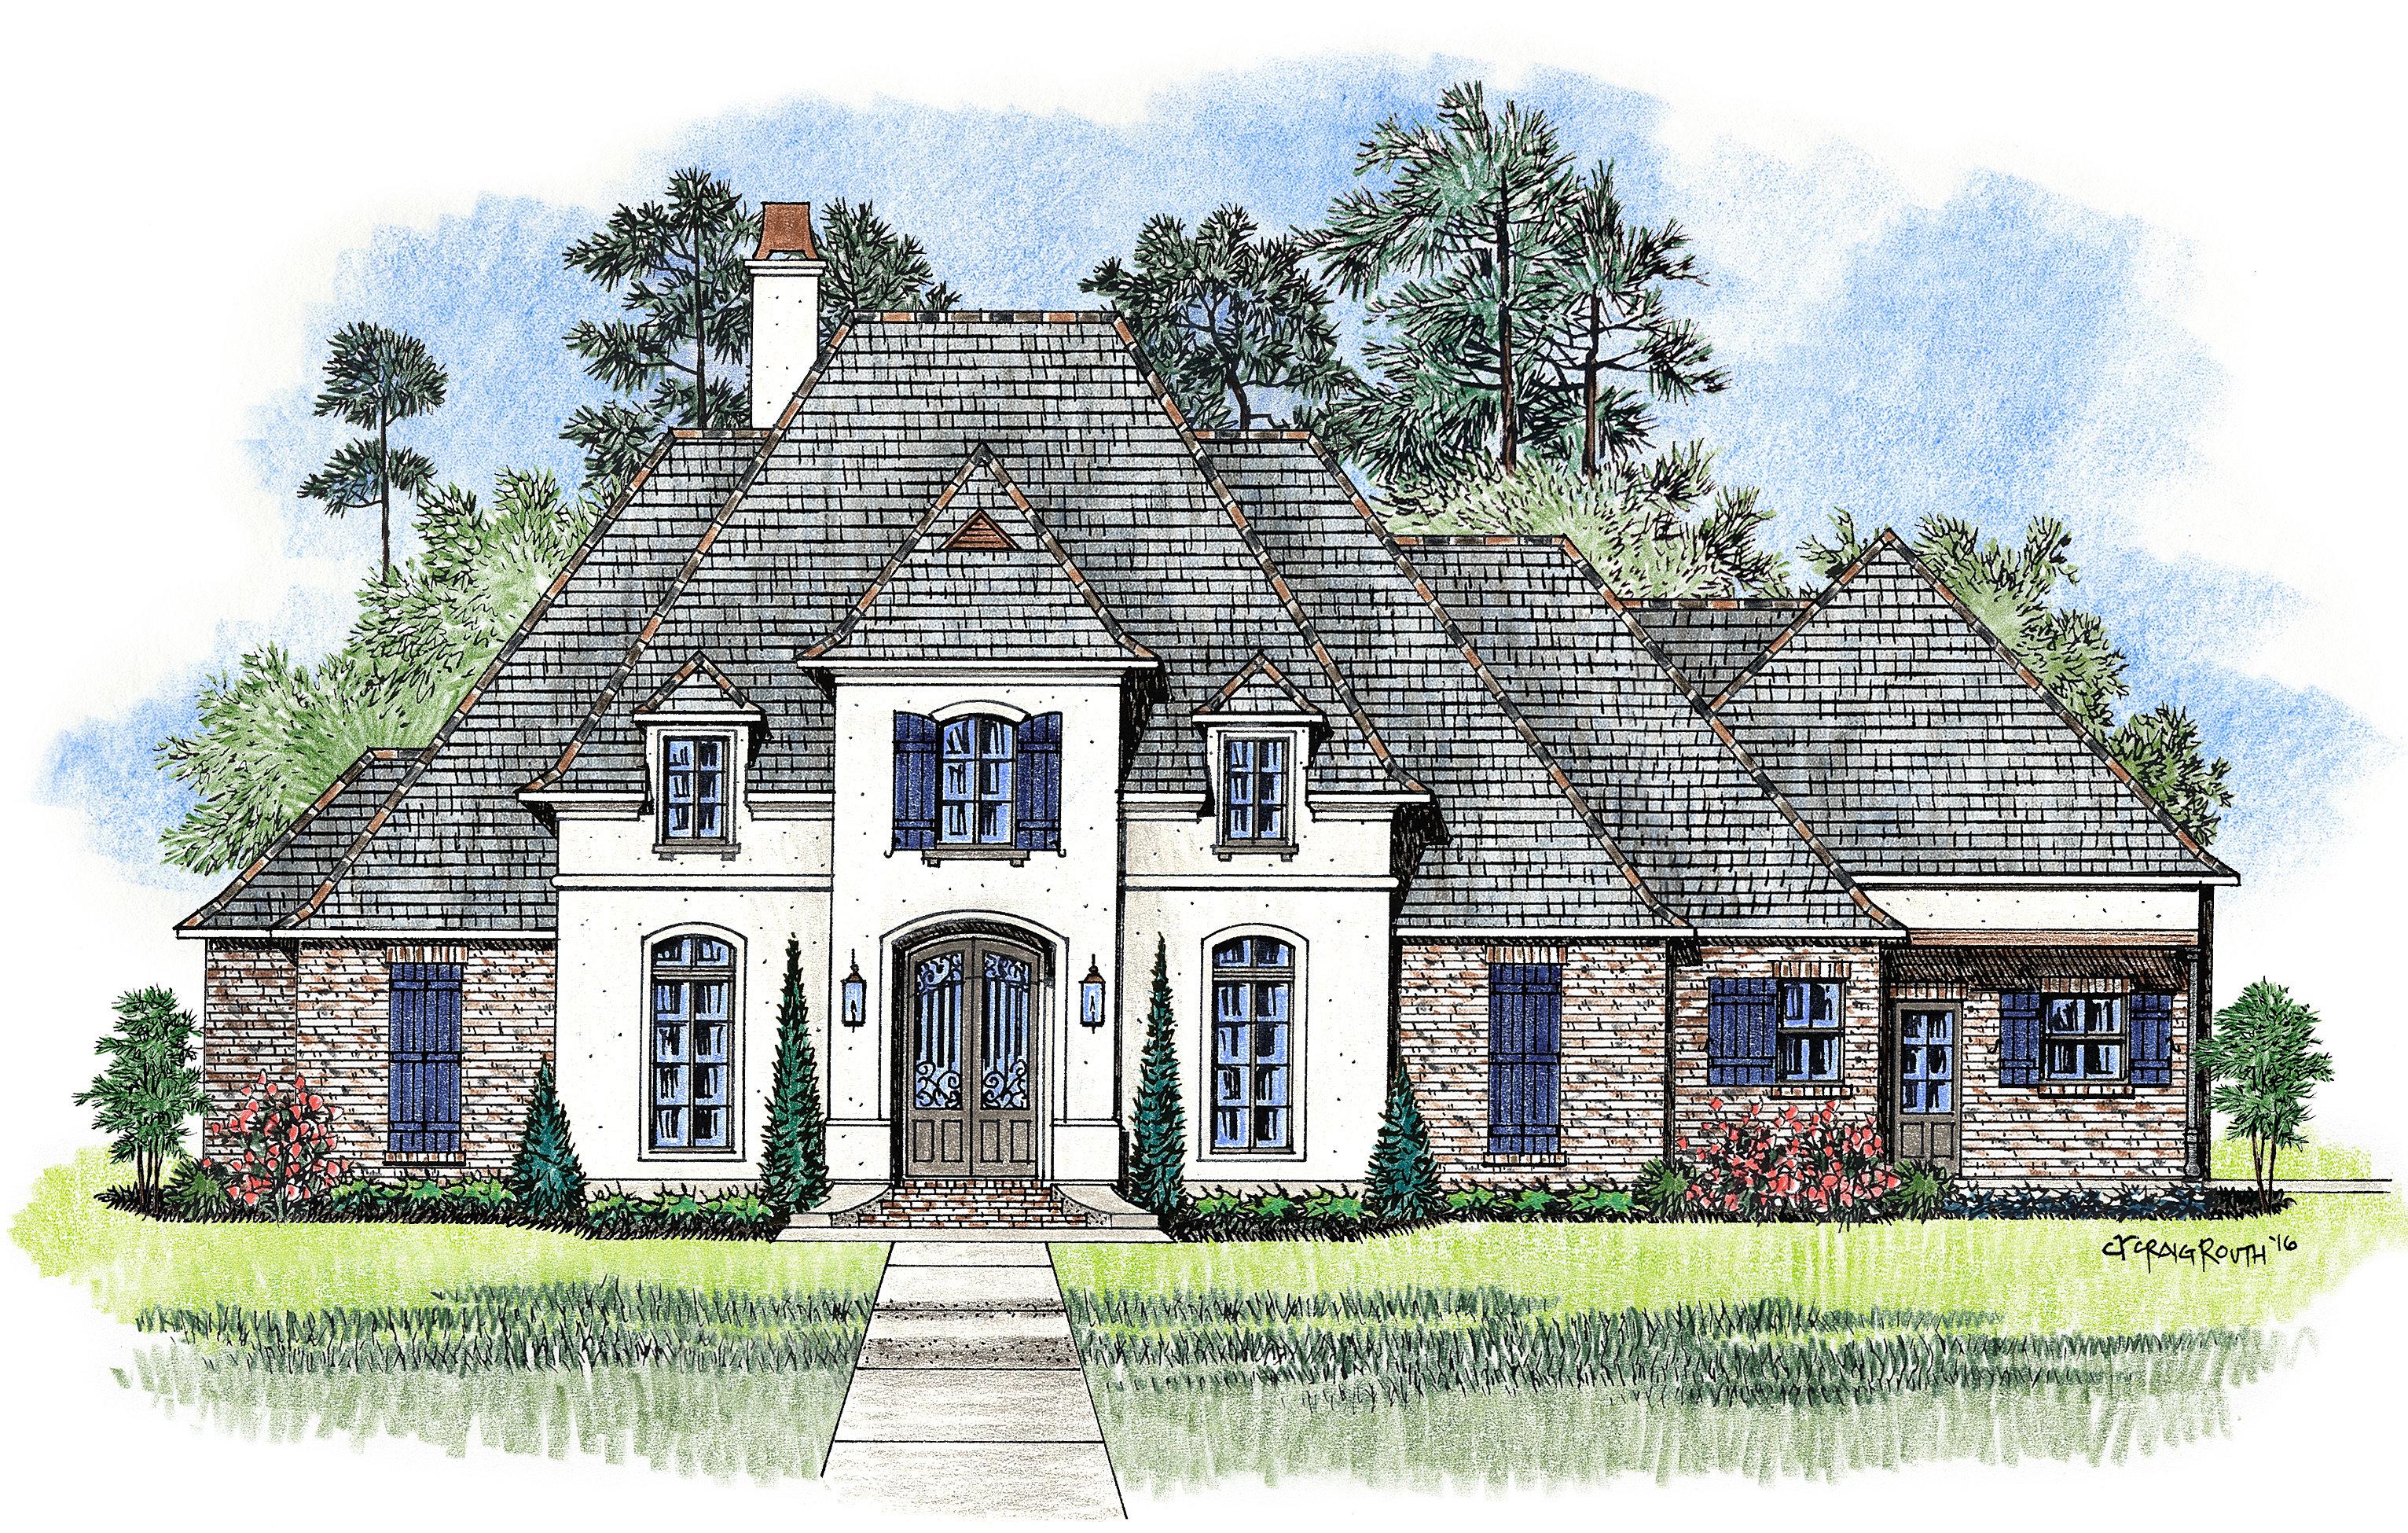 Wonderful Acadian Cottage Style Home - 564514_5a721769b2b94af8b16cc6a16a1e1ff3~mv2_d_3064_1950_s_2  Snapshot_483060.00_jpg_srz